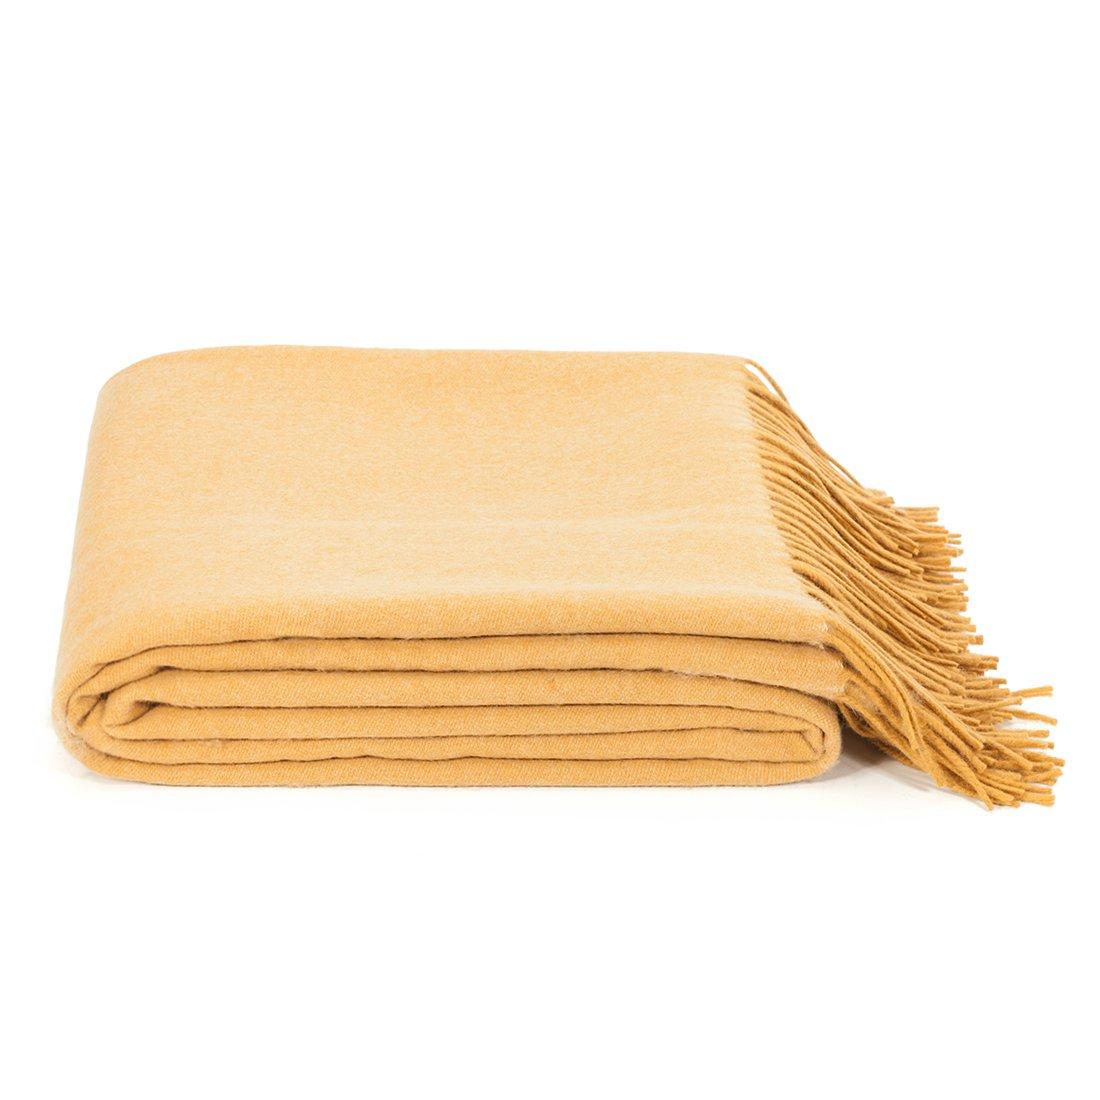 spencer & whitney Wool Blanket Throw Australian Wool Soft Light Blanket Four Season Use Wool Blanket 100 Wool Light And Breathability